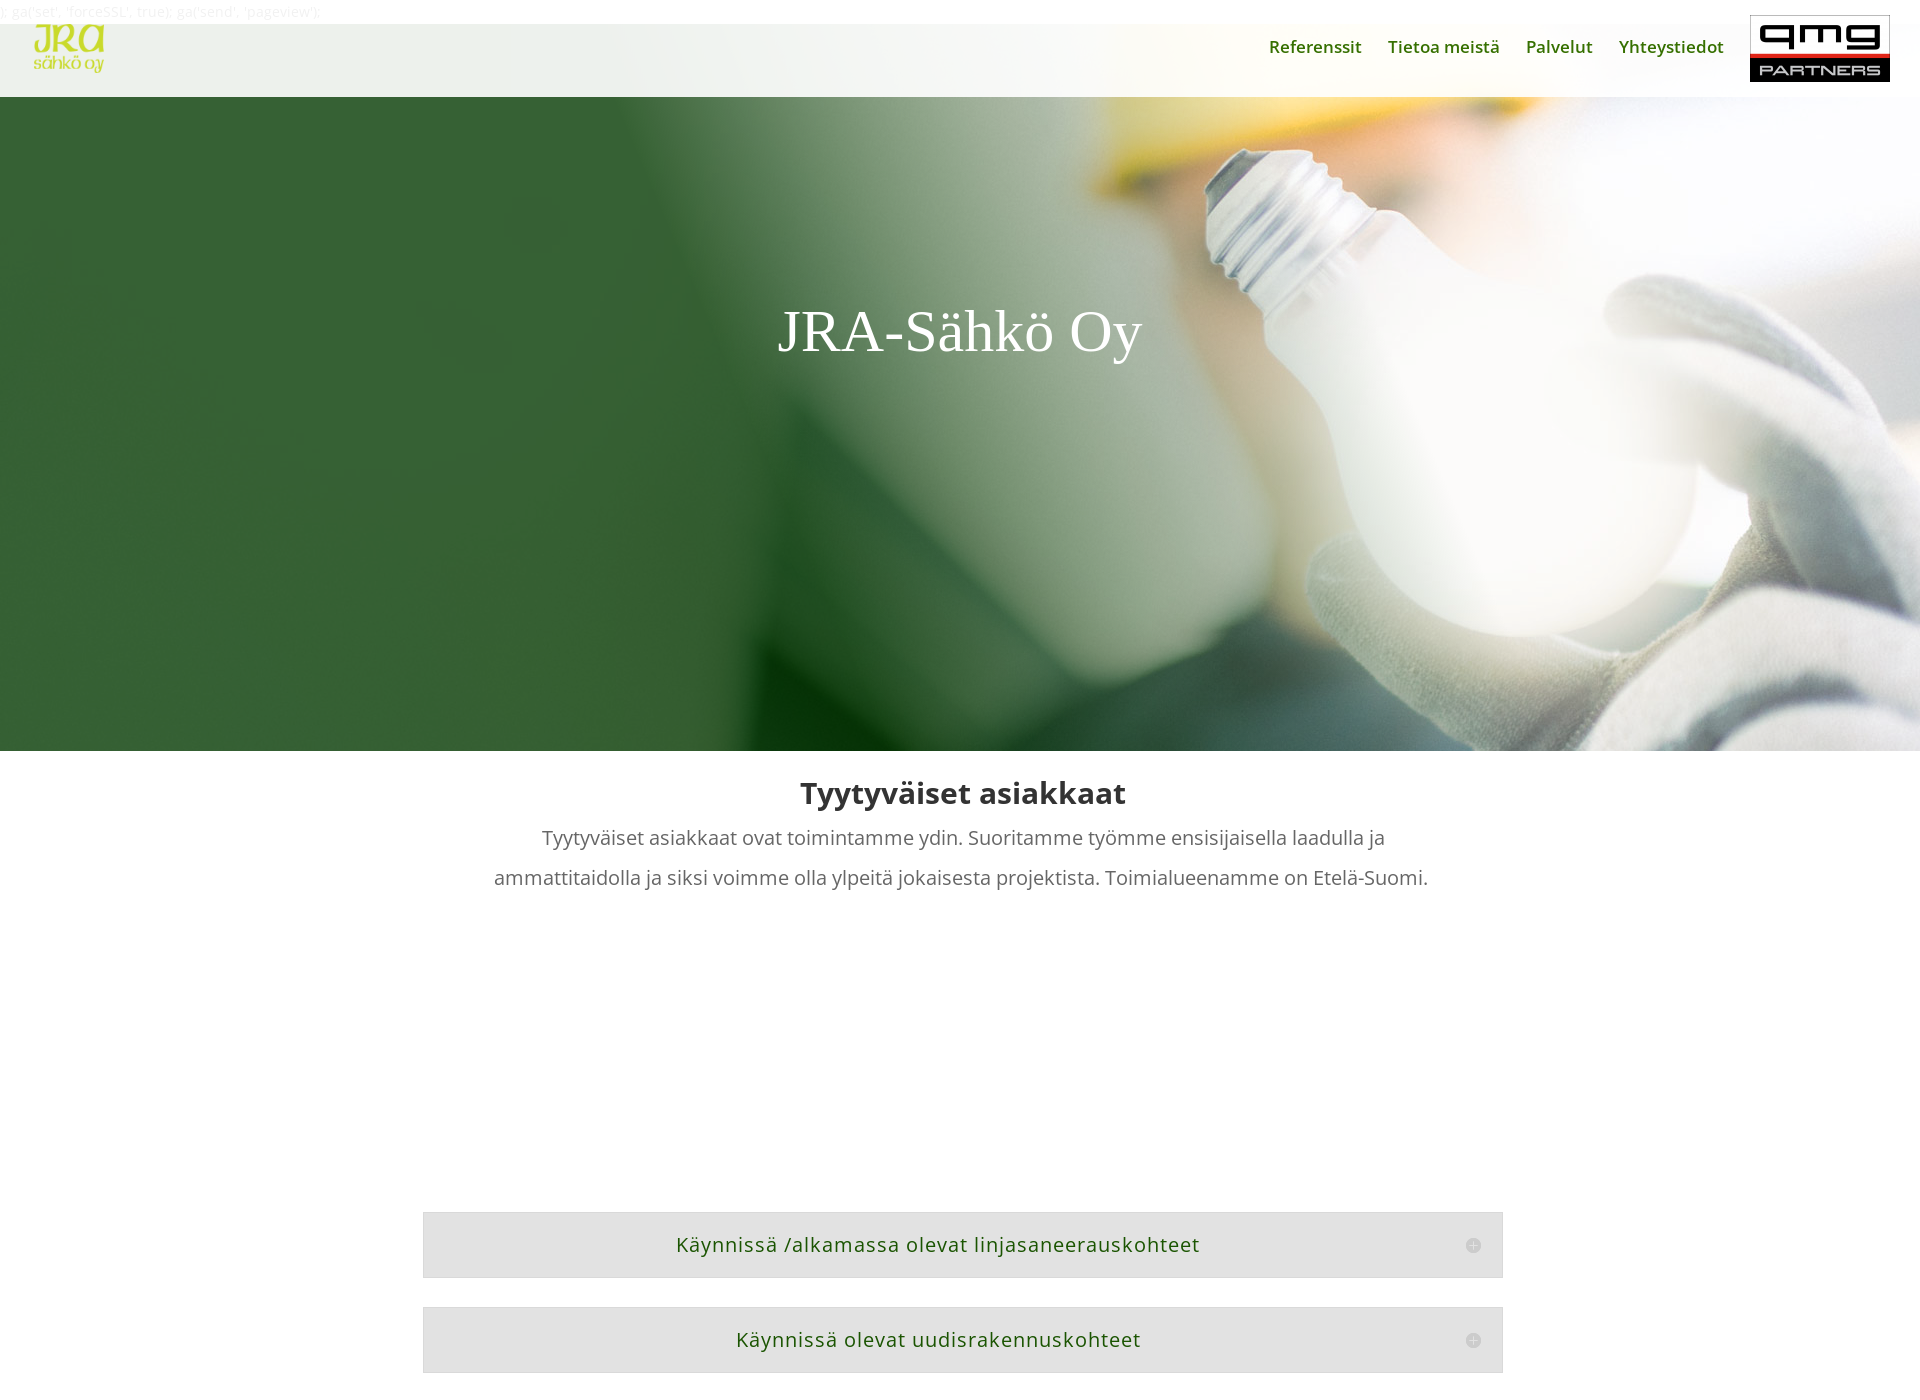 Screenshot for jra-sahko.fi